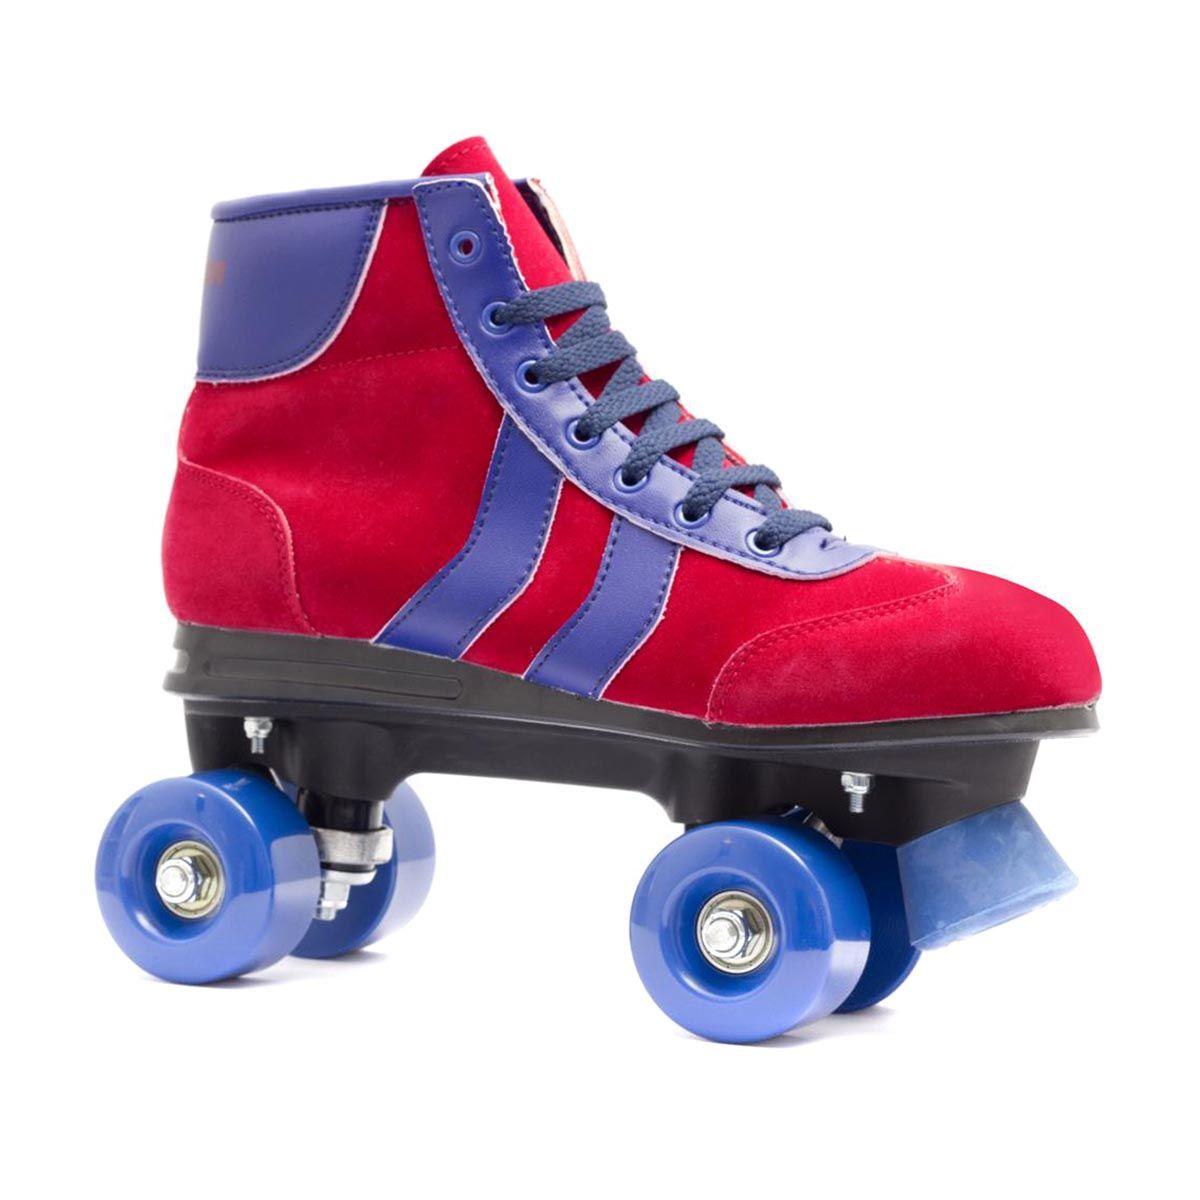 Roller skates for free - Roller Skate Accessories Blazer Retro Quad Roller Skates Red Blue Free Uk